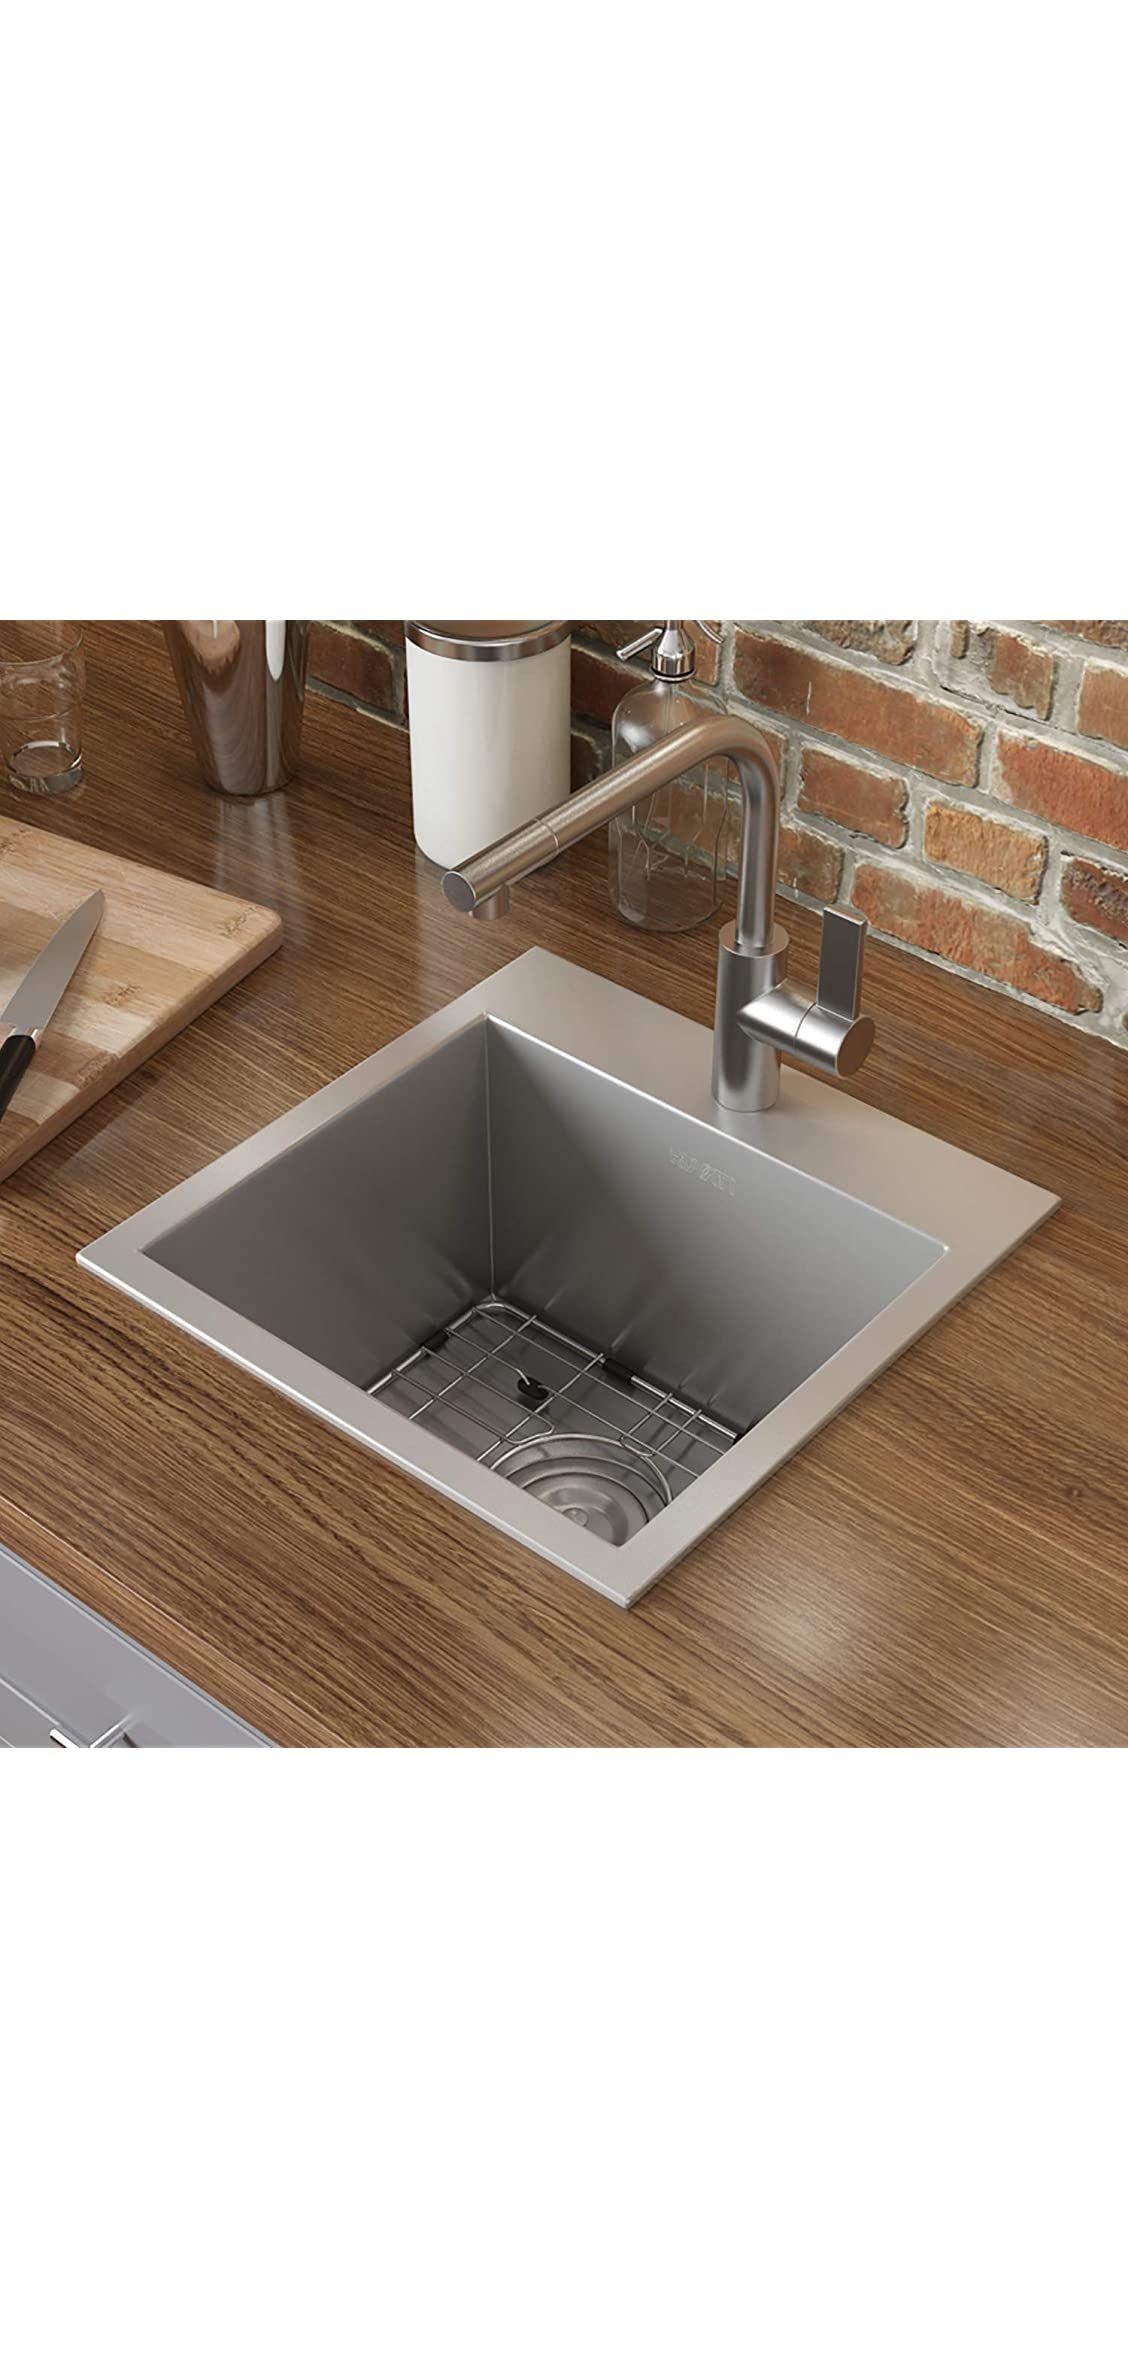 Stainless Steel Sink Ruvati 15 X 15 Inch Drop In Topmount Bar Prep Sink 1 In 2020 Clean Stainless Steel Sink Stainless Steel Kitchen Island Stainless Steel Countertops